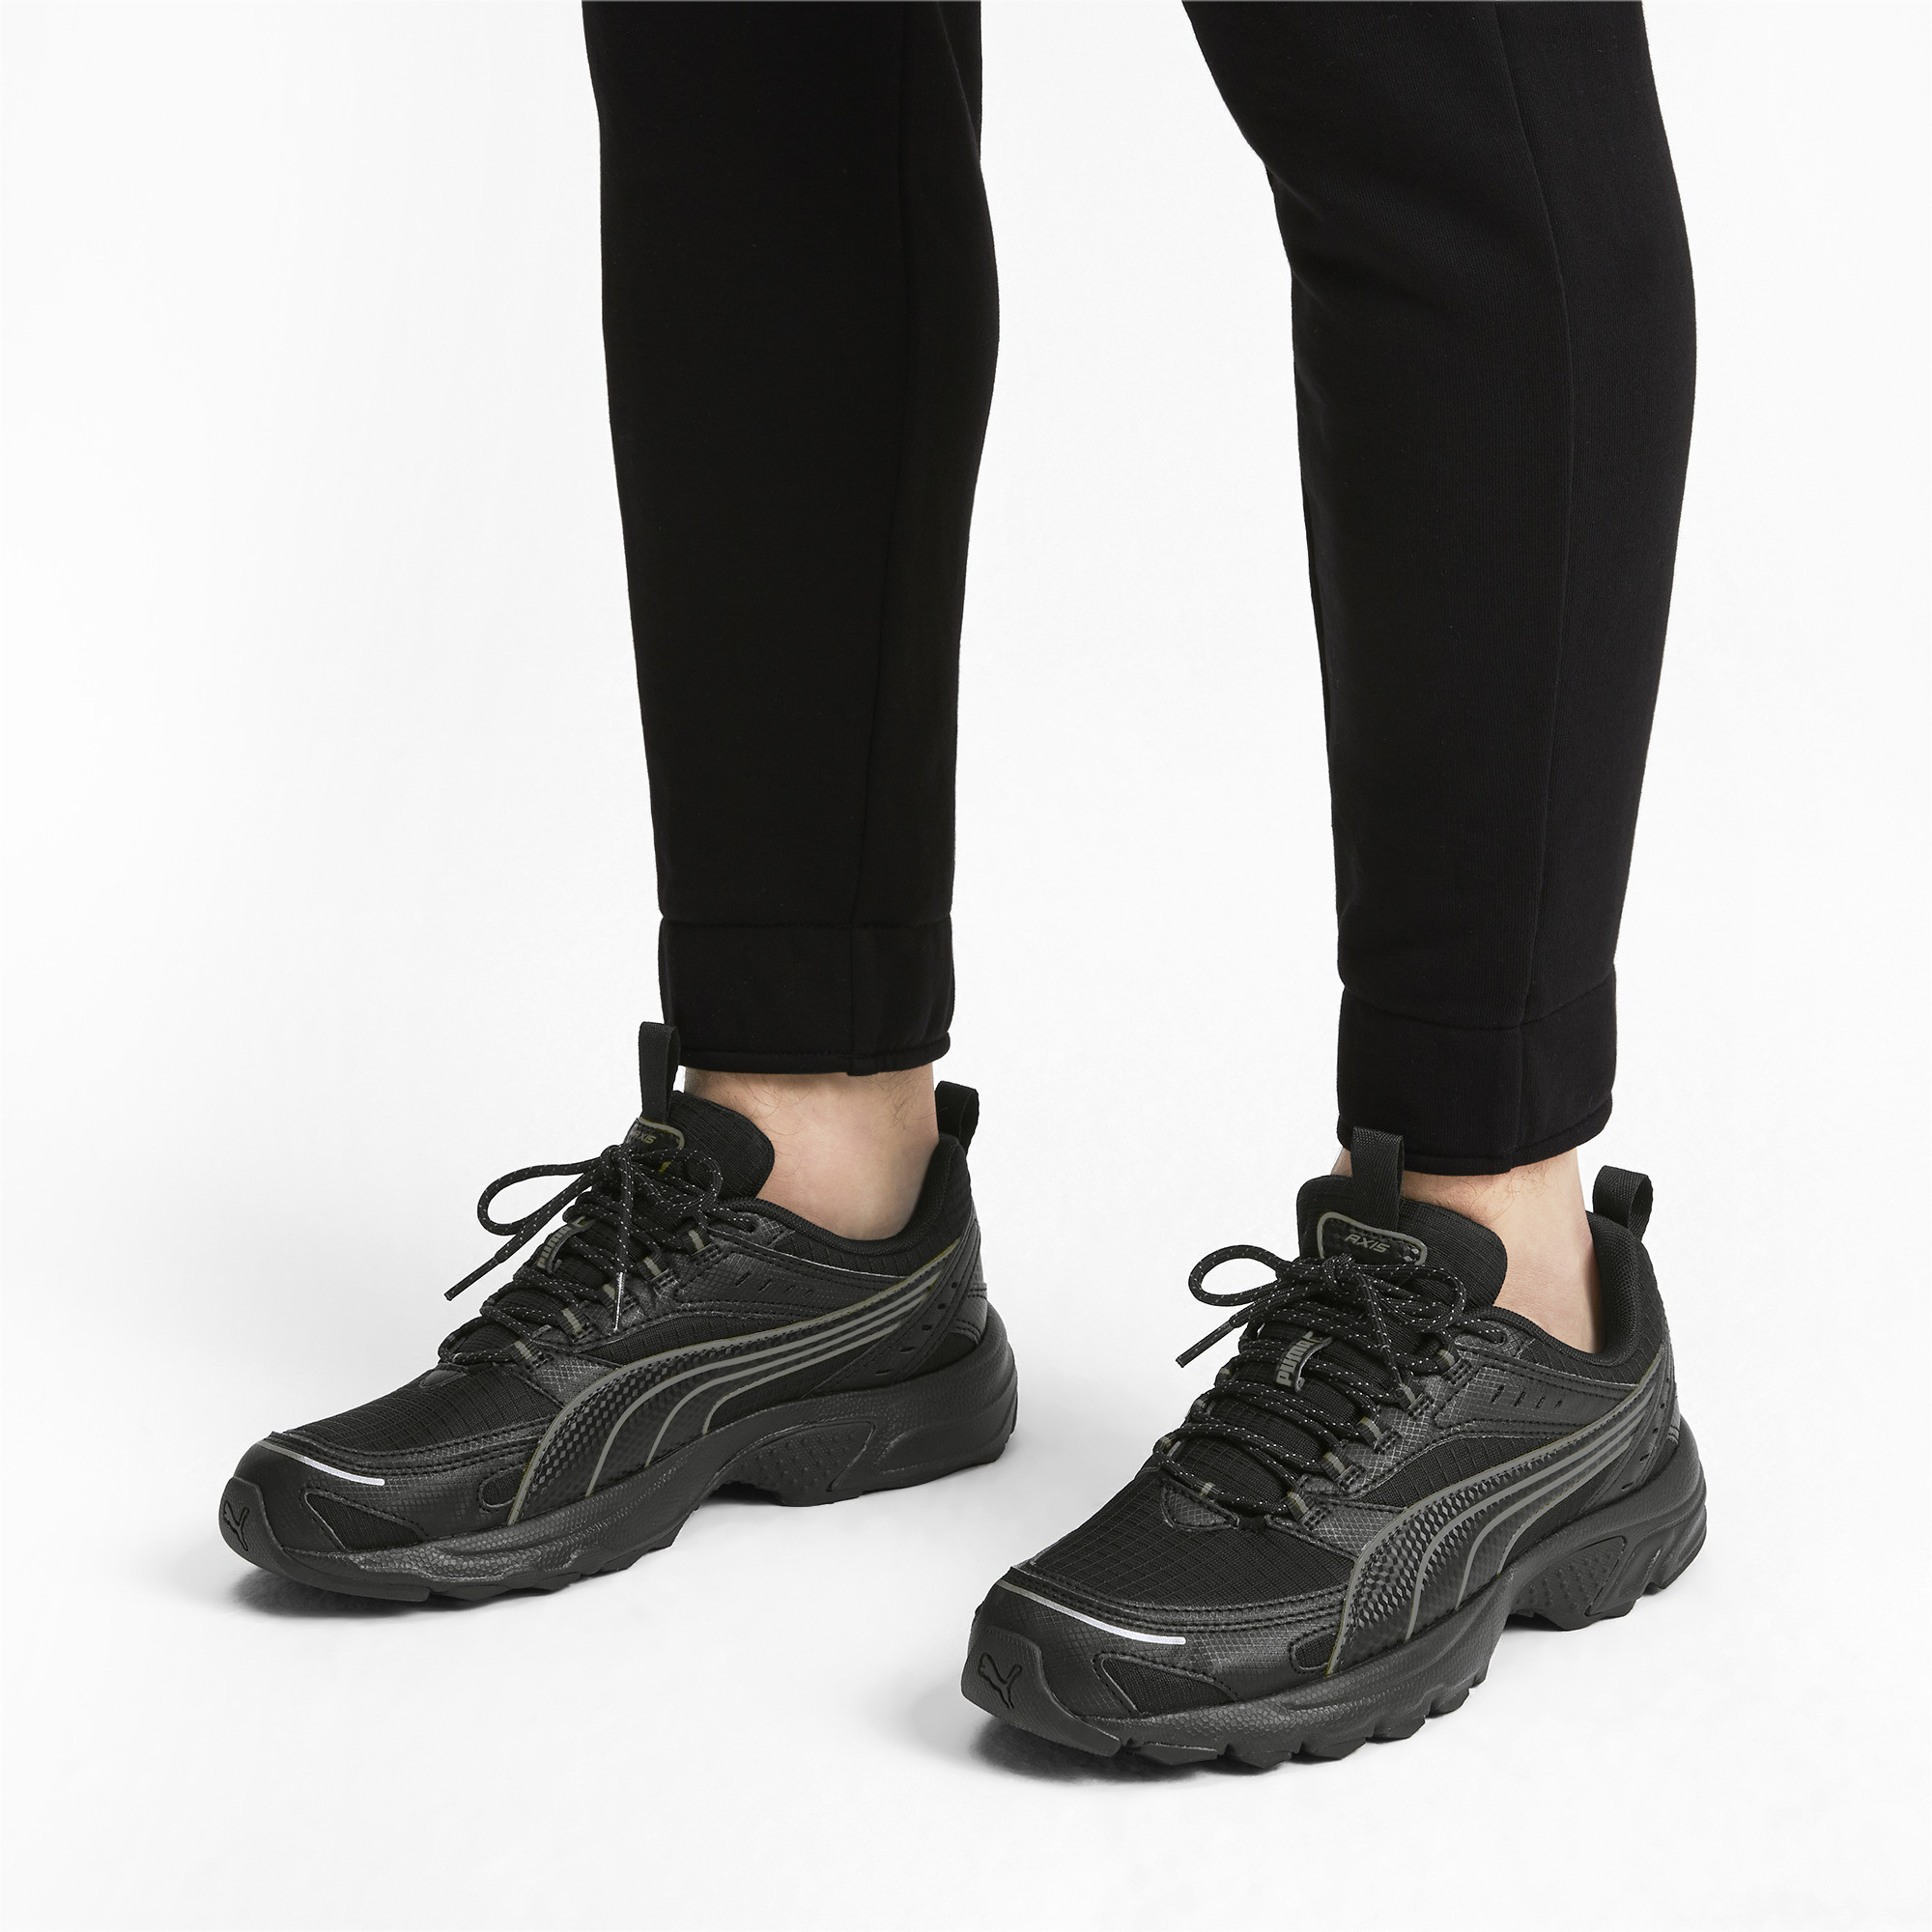 PUMA-Axis-Trail-Sneakers-Men-Shoe-Basics miniature 5